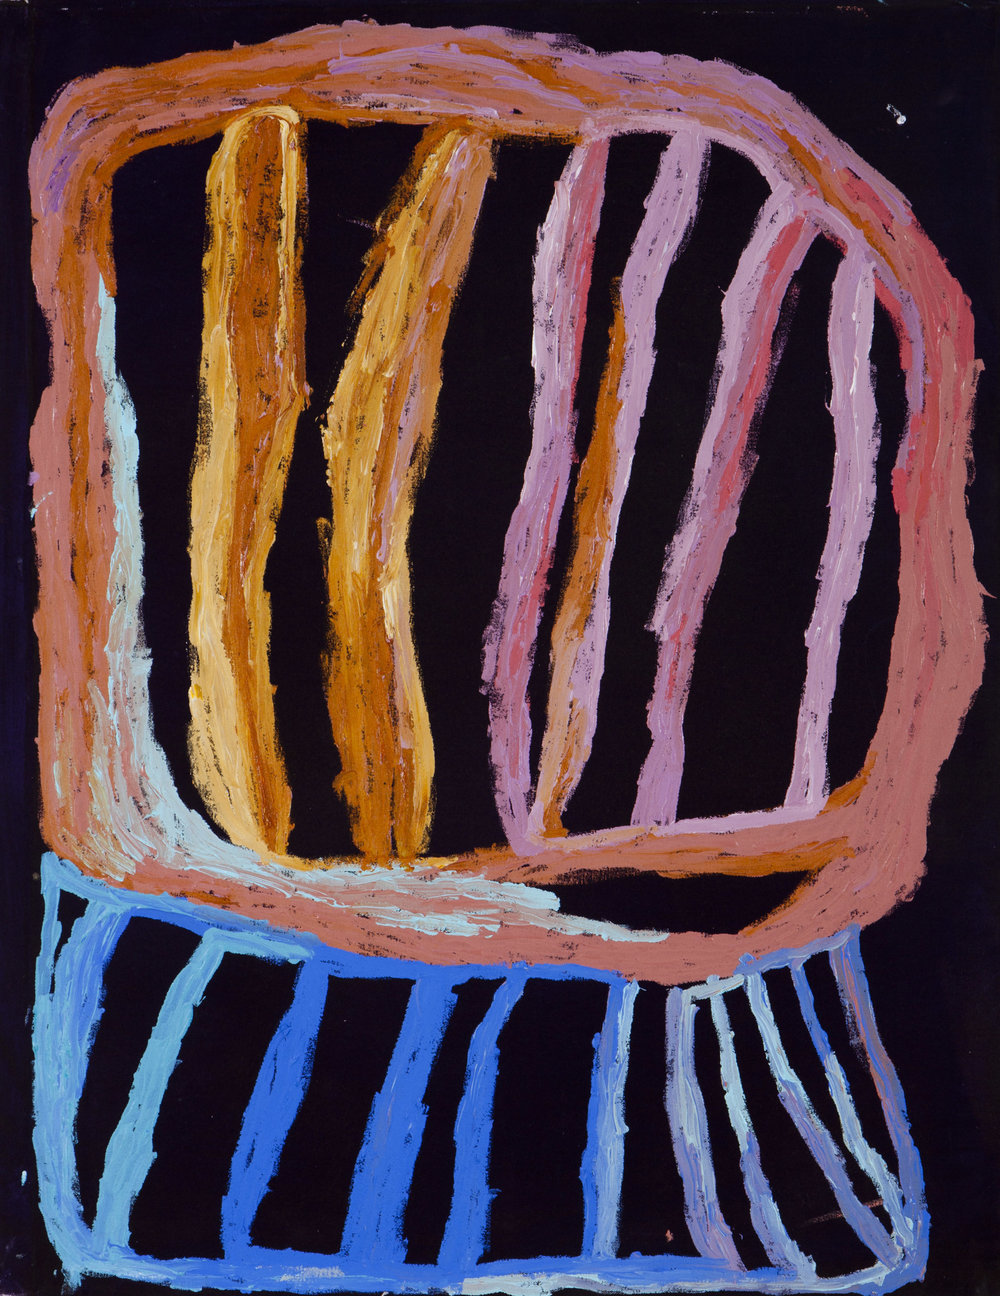 "NYARAPAYI GILES  Warmurrungu  30"" x 40"" (76 x 101 cm) Acrylic on Belgian linen Tjarlirli Artists catalog #12-237   SOLD"